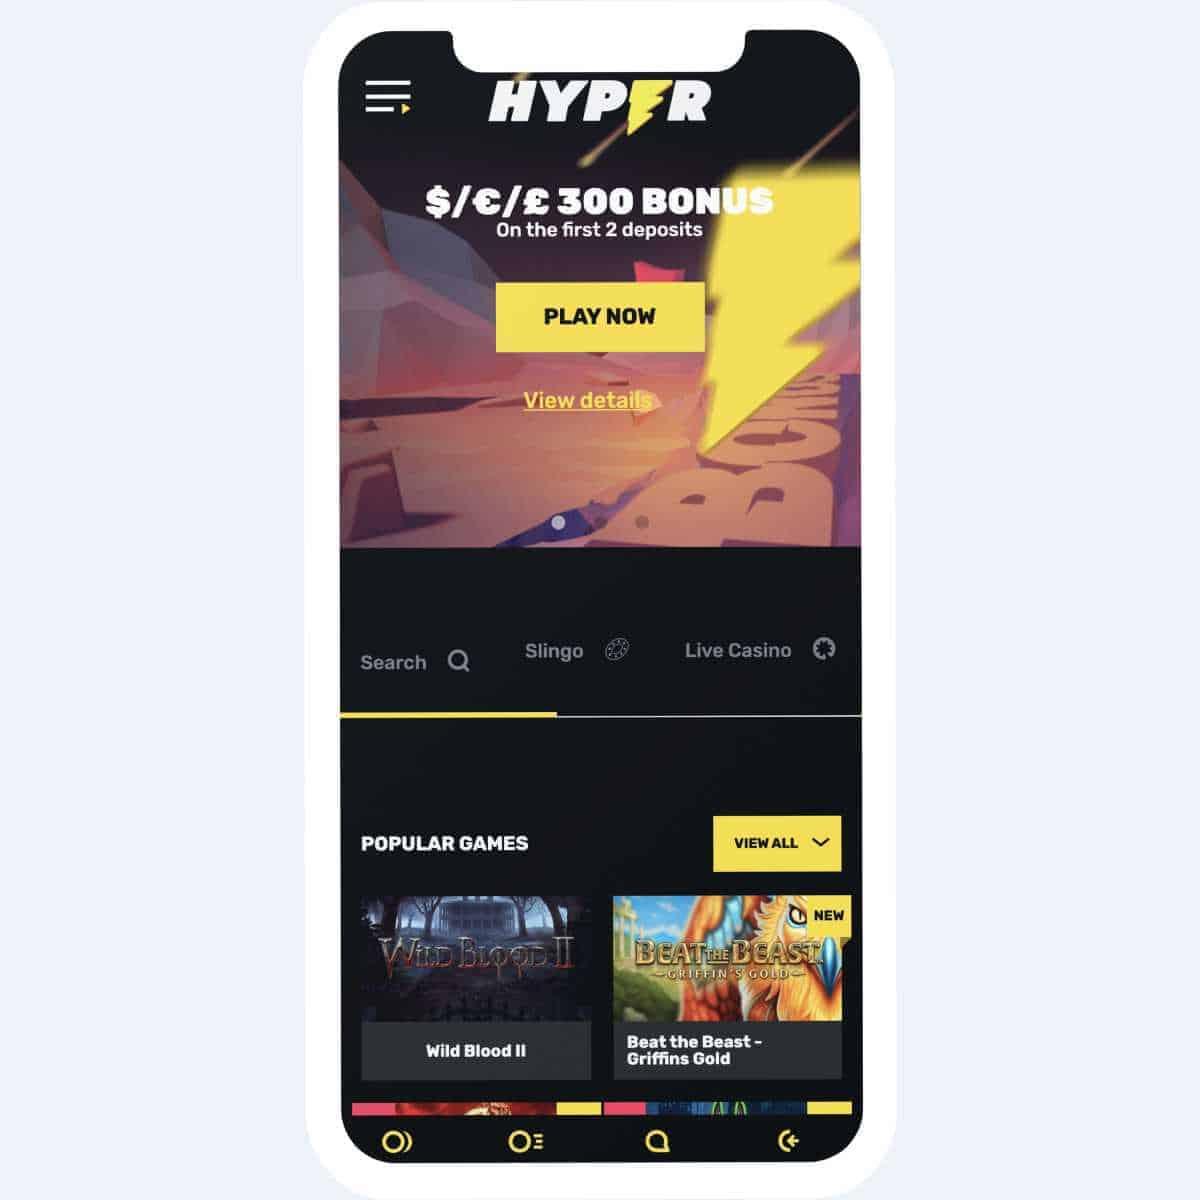 hyper casino homepage mobile